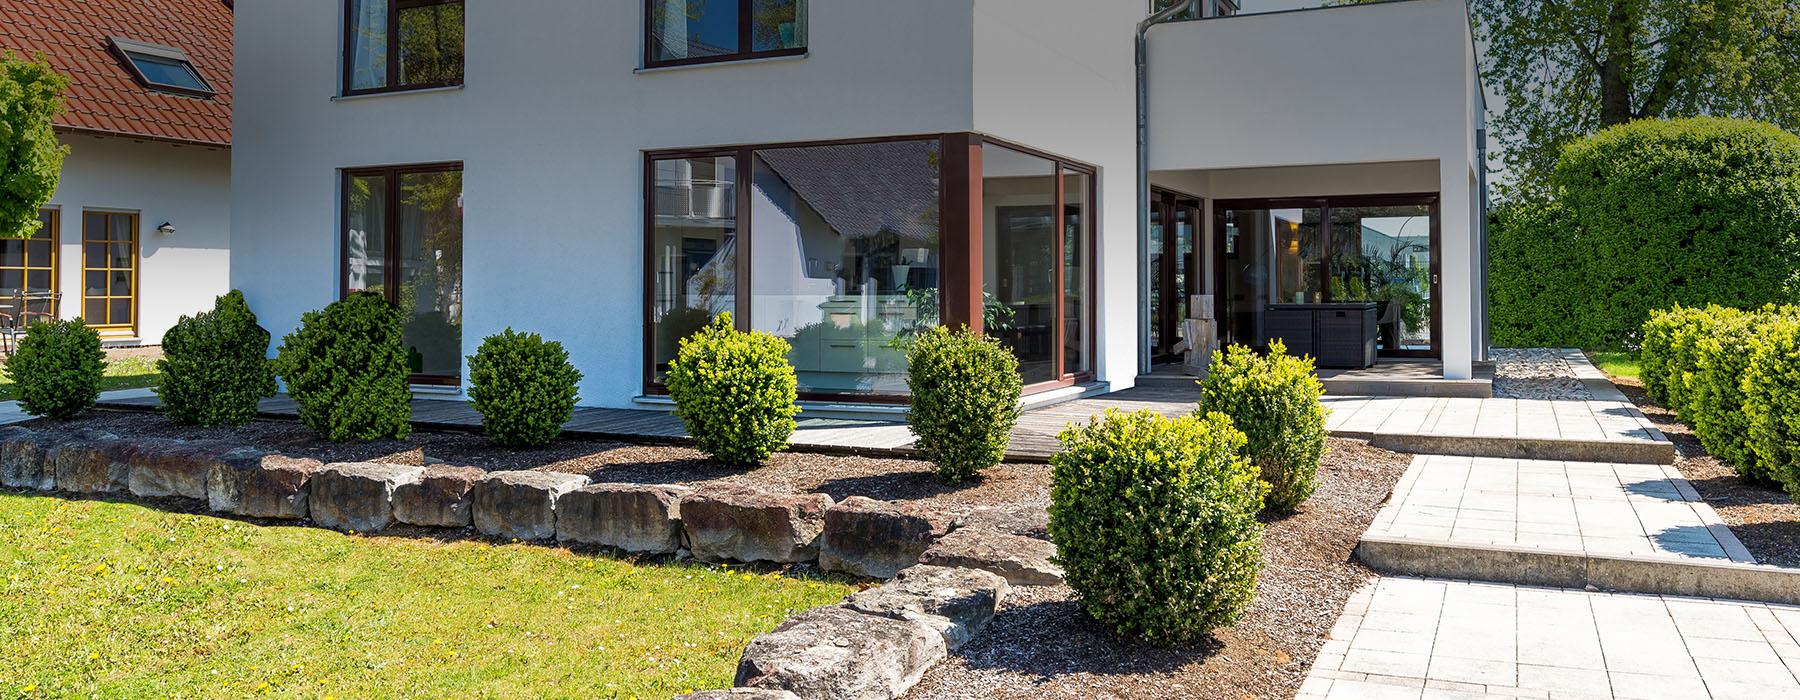 Bretagne propri t s services agence immobili re for Agence immobiliere josselin